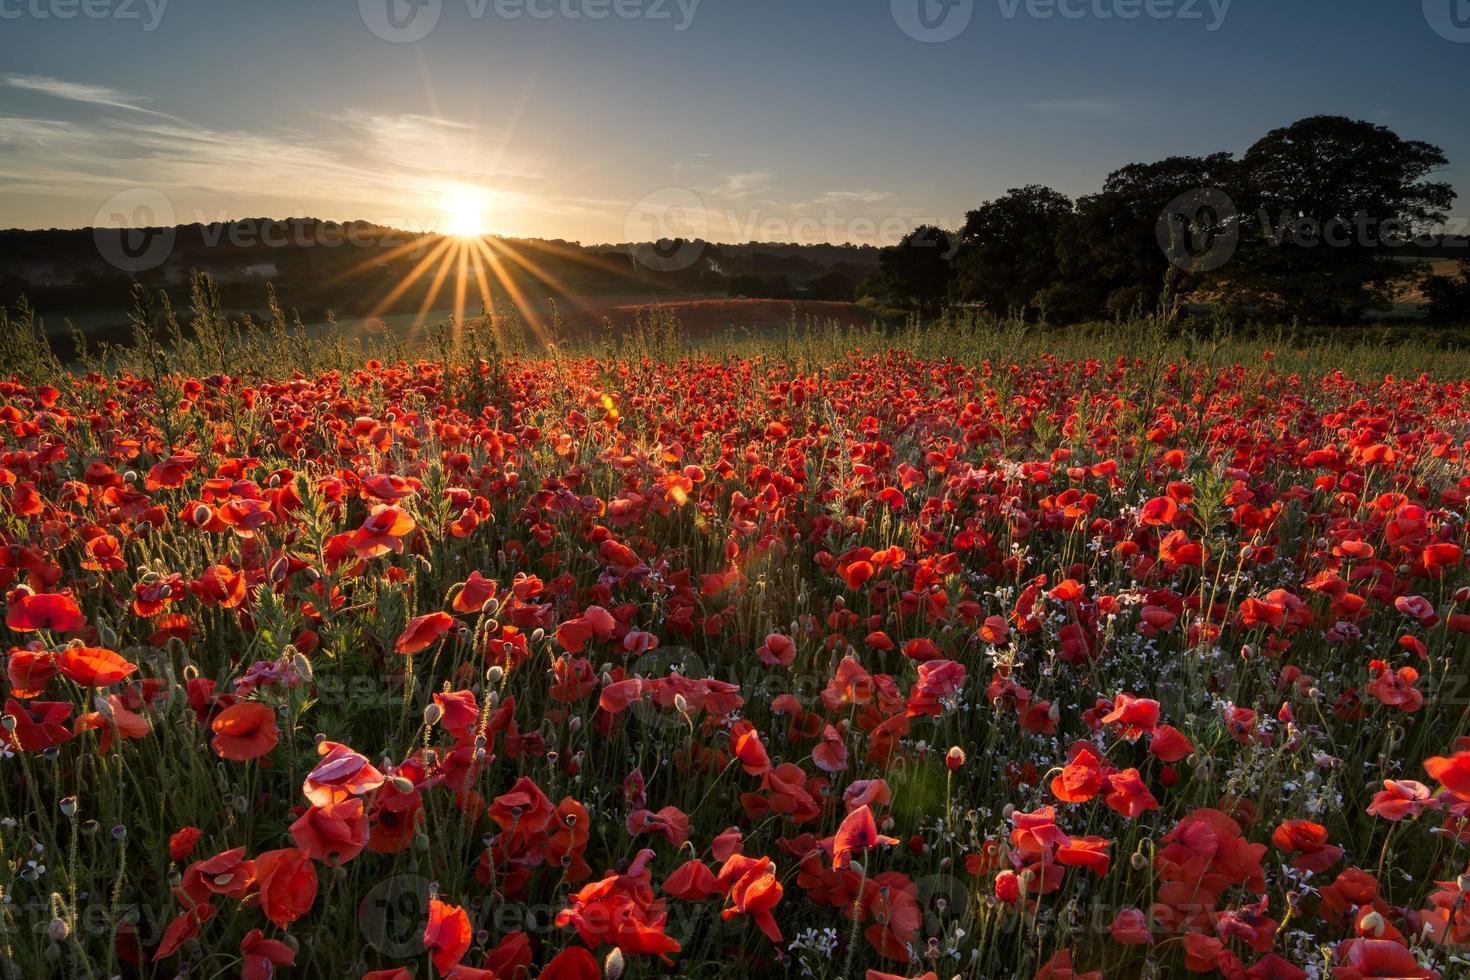 zomerzonnewende zonsopgang foto